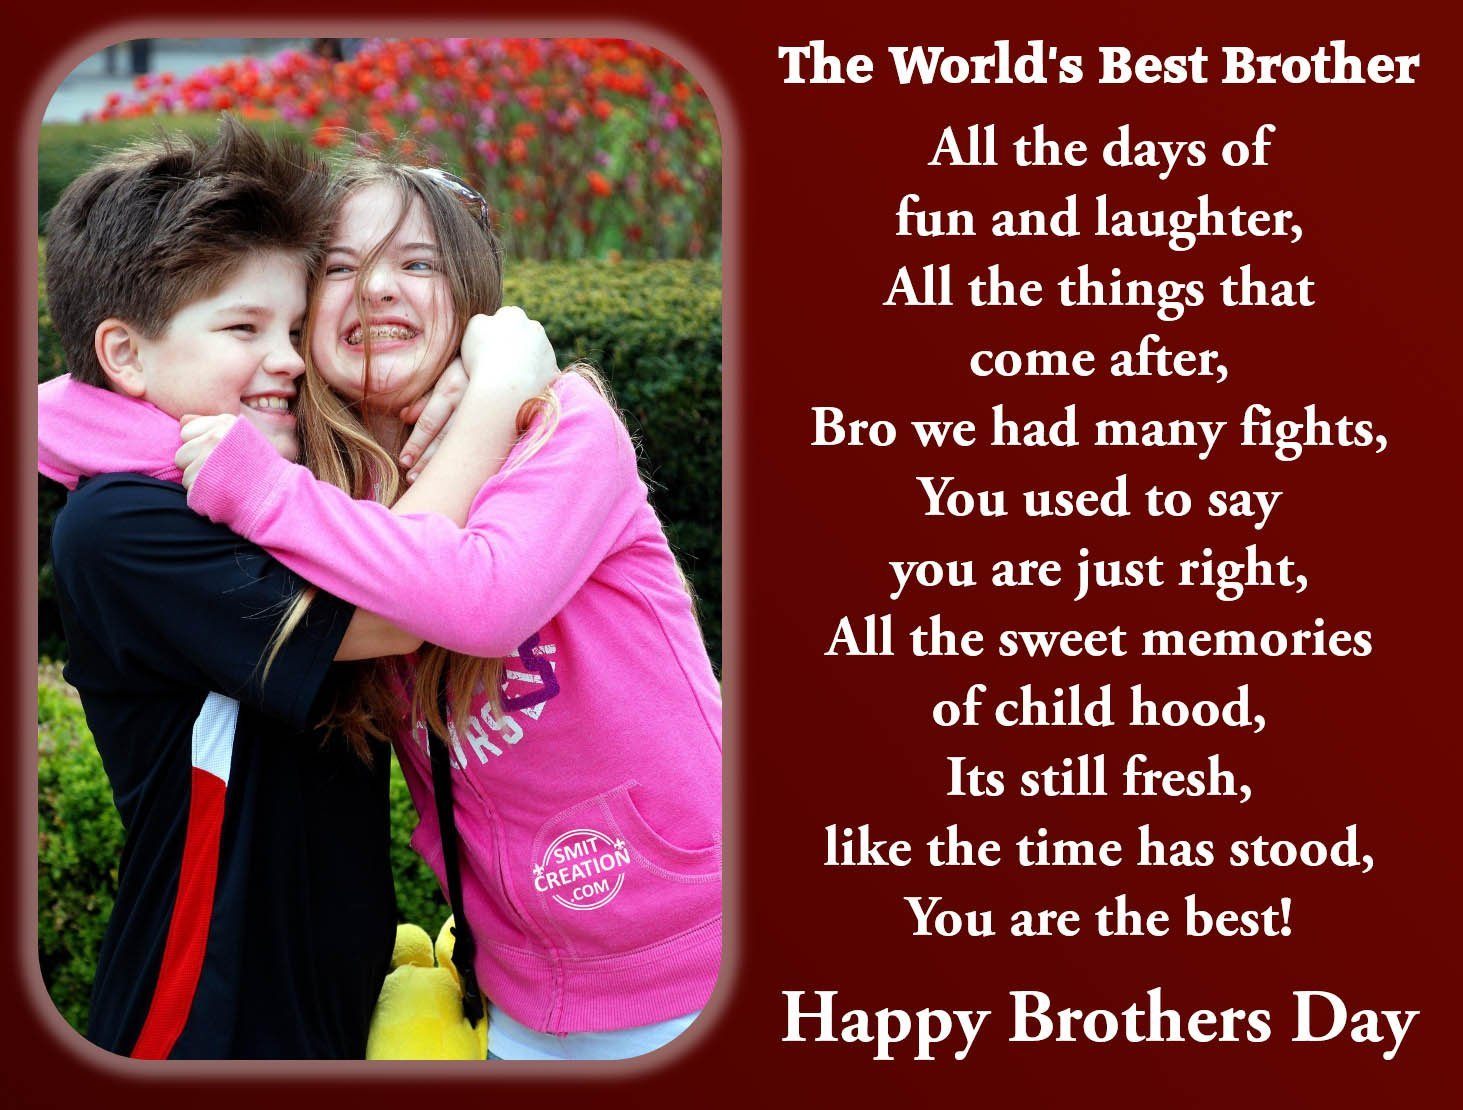 Happy Brothers Day - SmitCreation.com